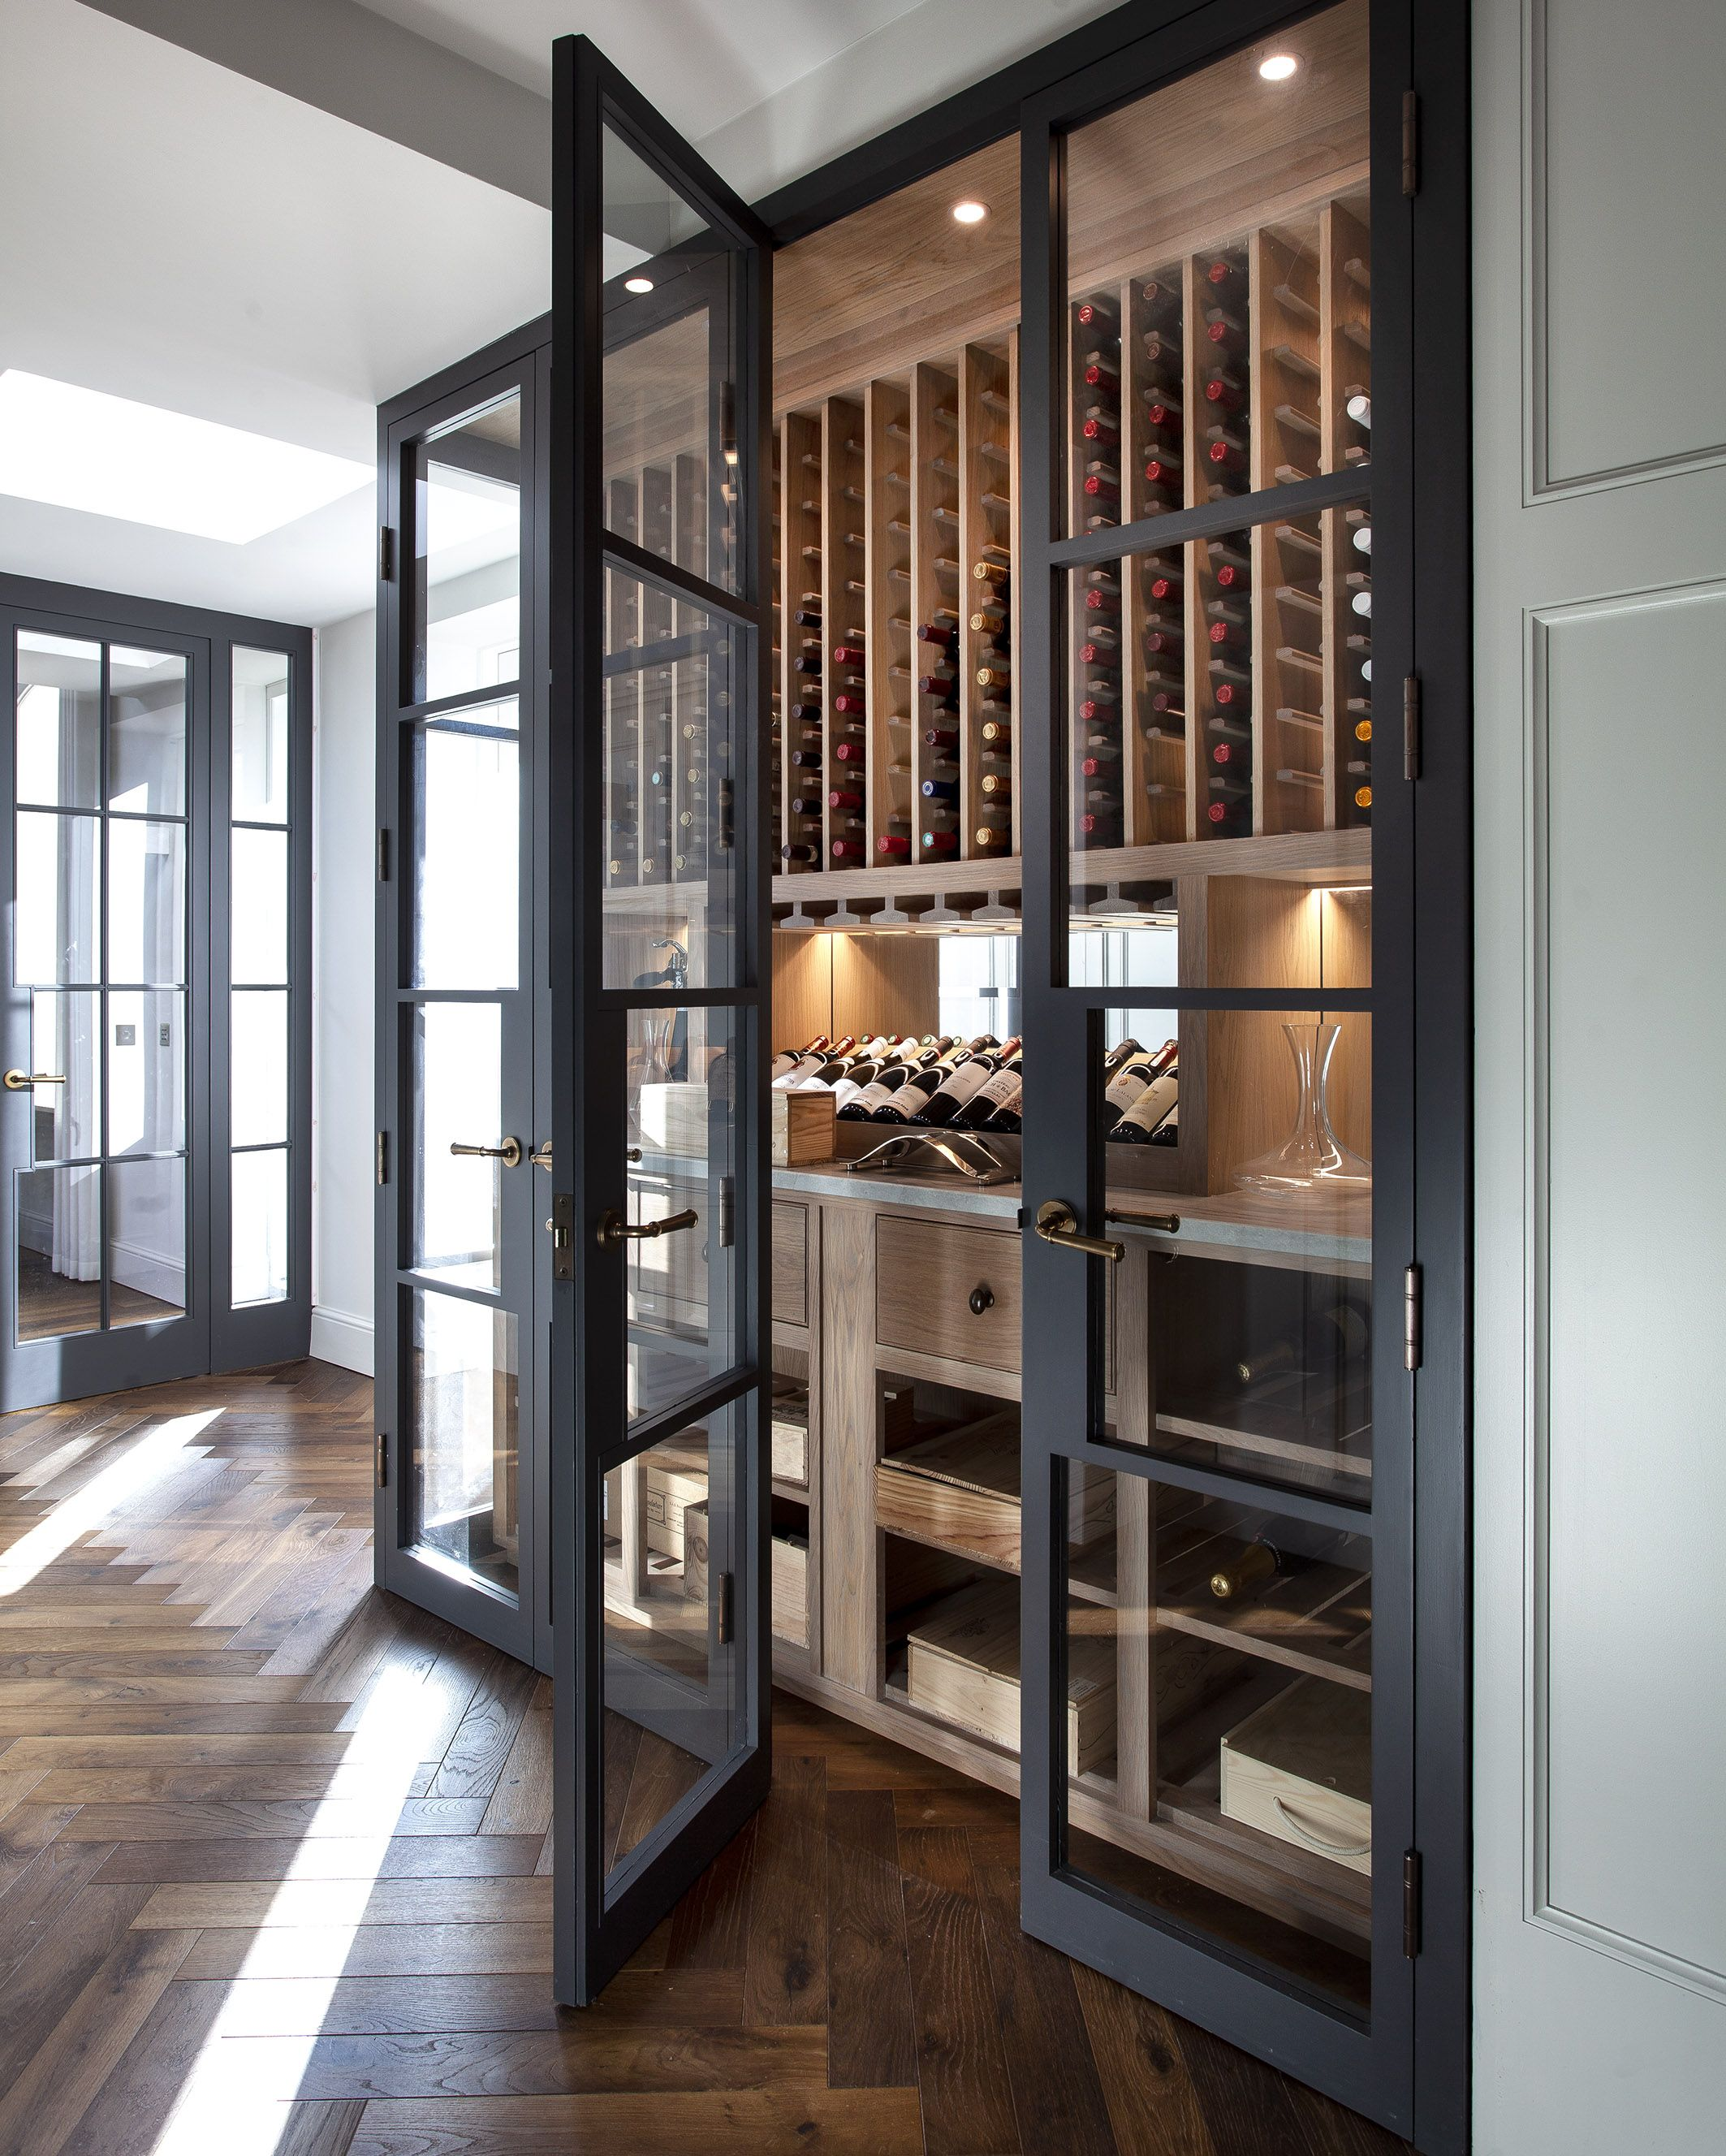 Woodale Design Studio